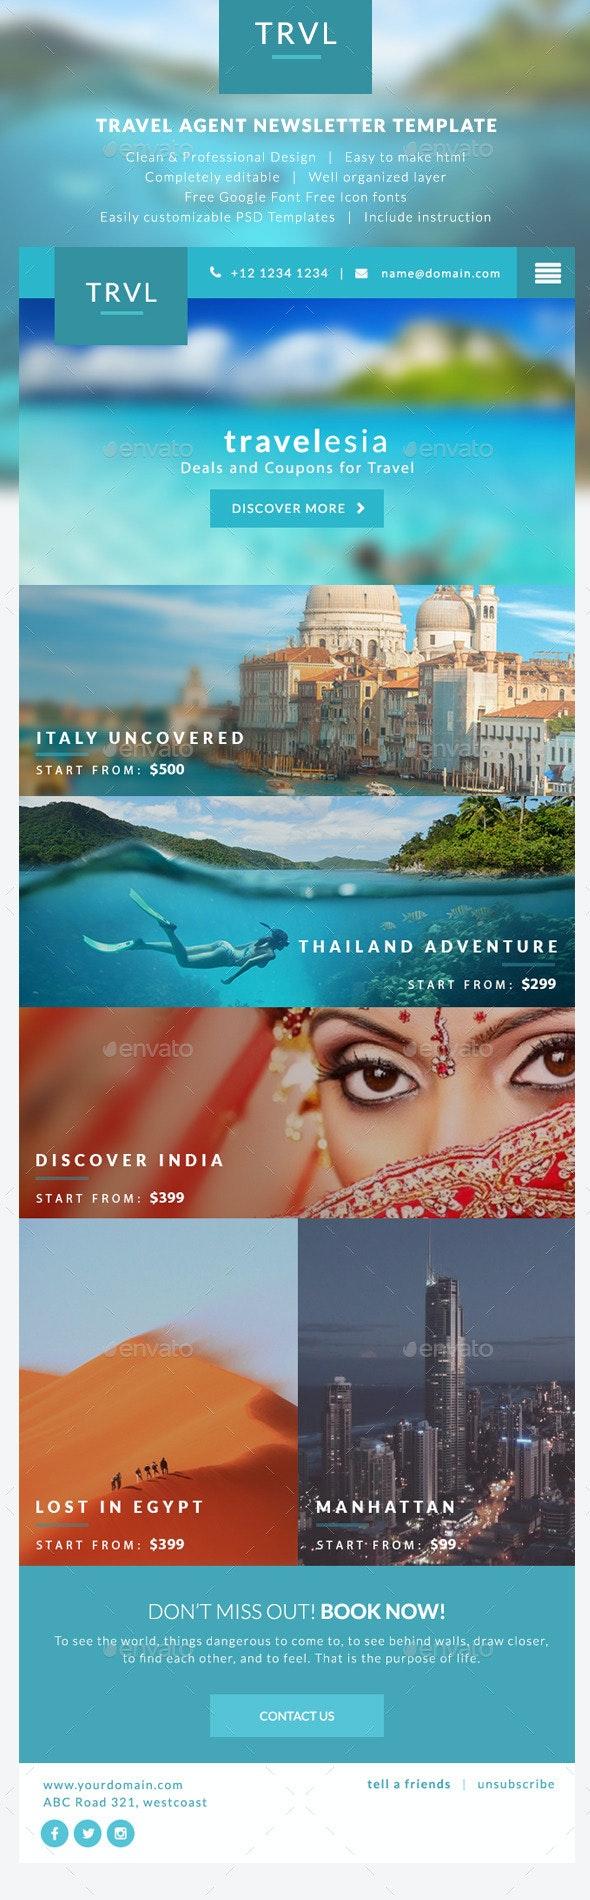 Travel Agent Newsletter Templates - Travelesia